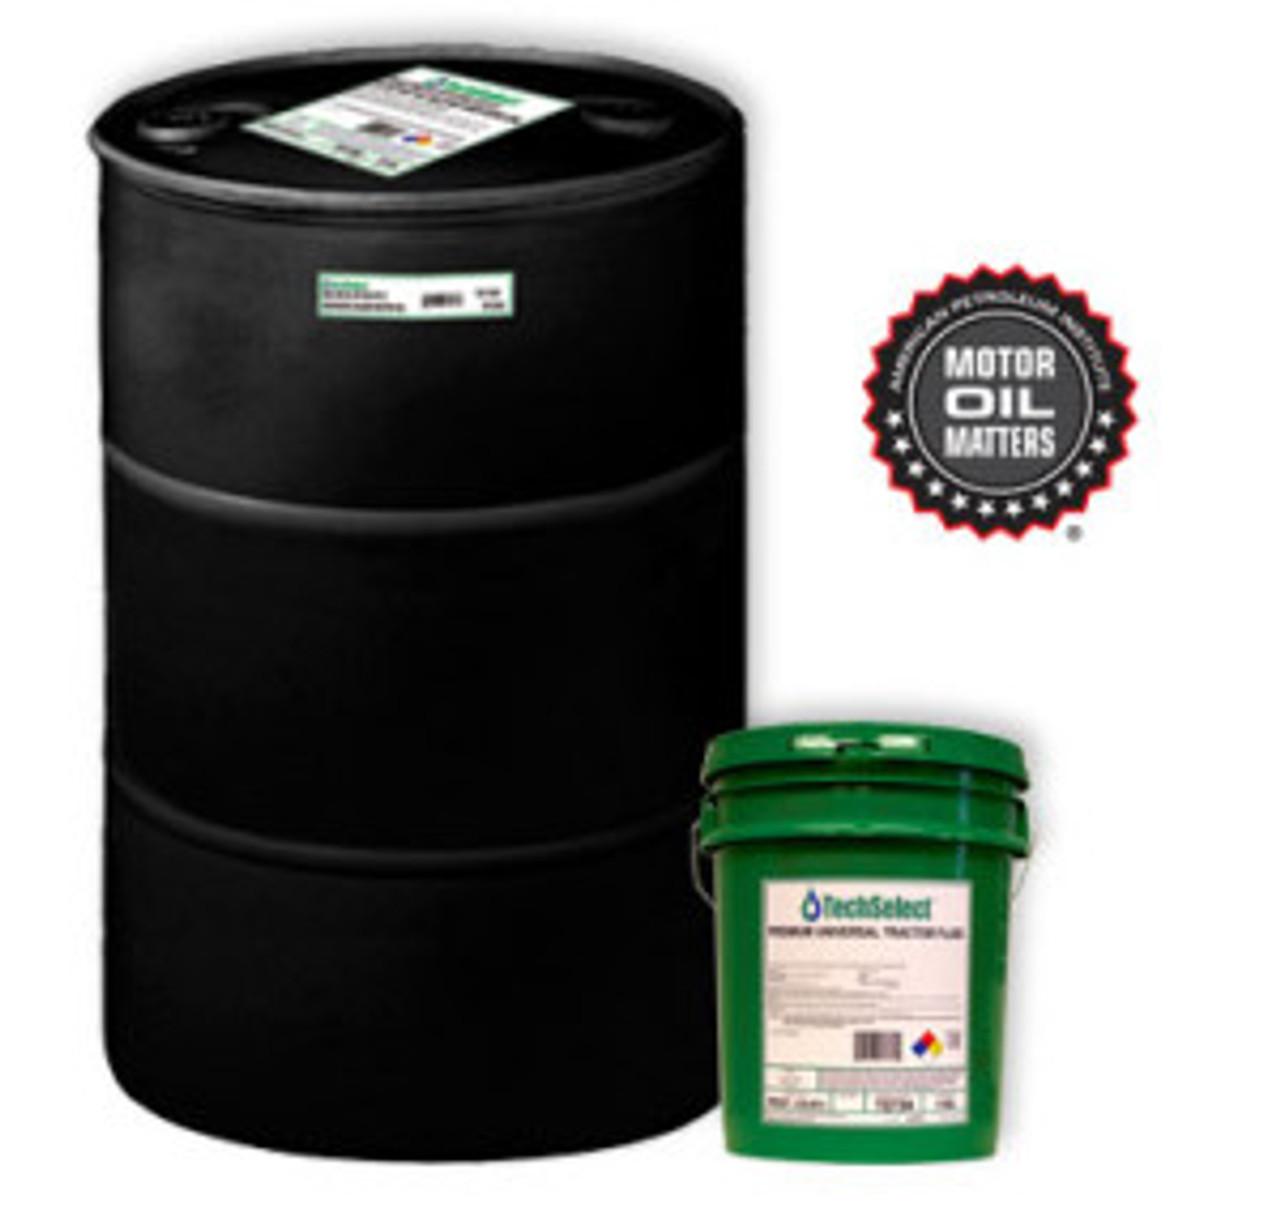 TechSelect Drip Oil 5 Gallon Pail